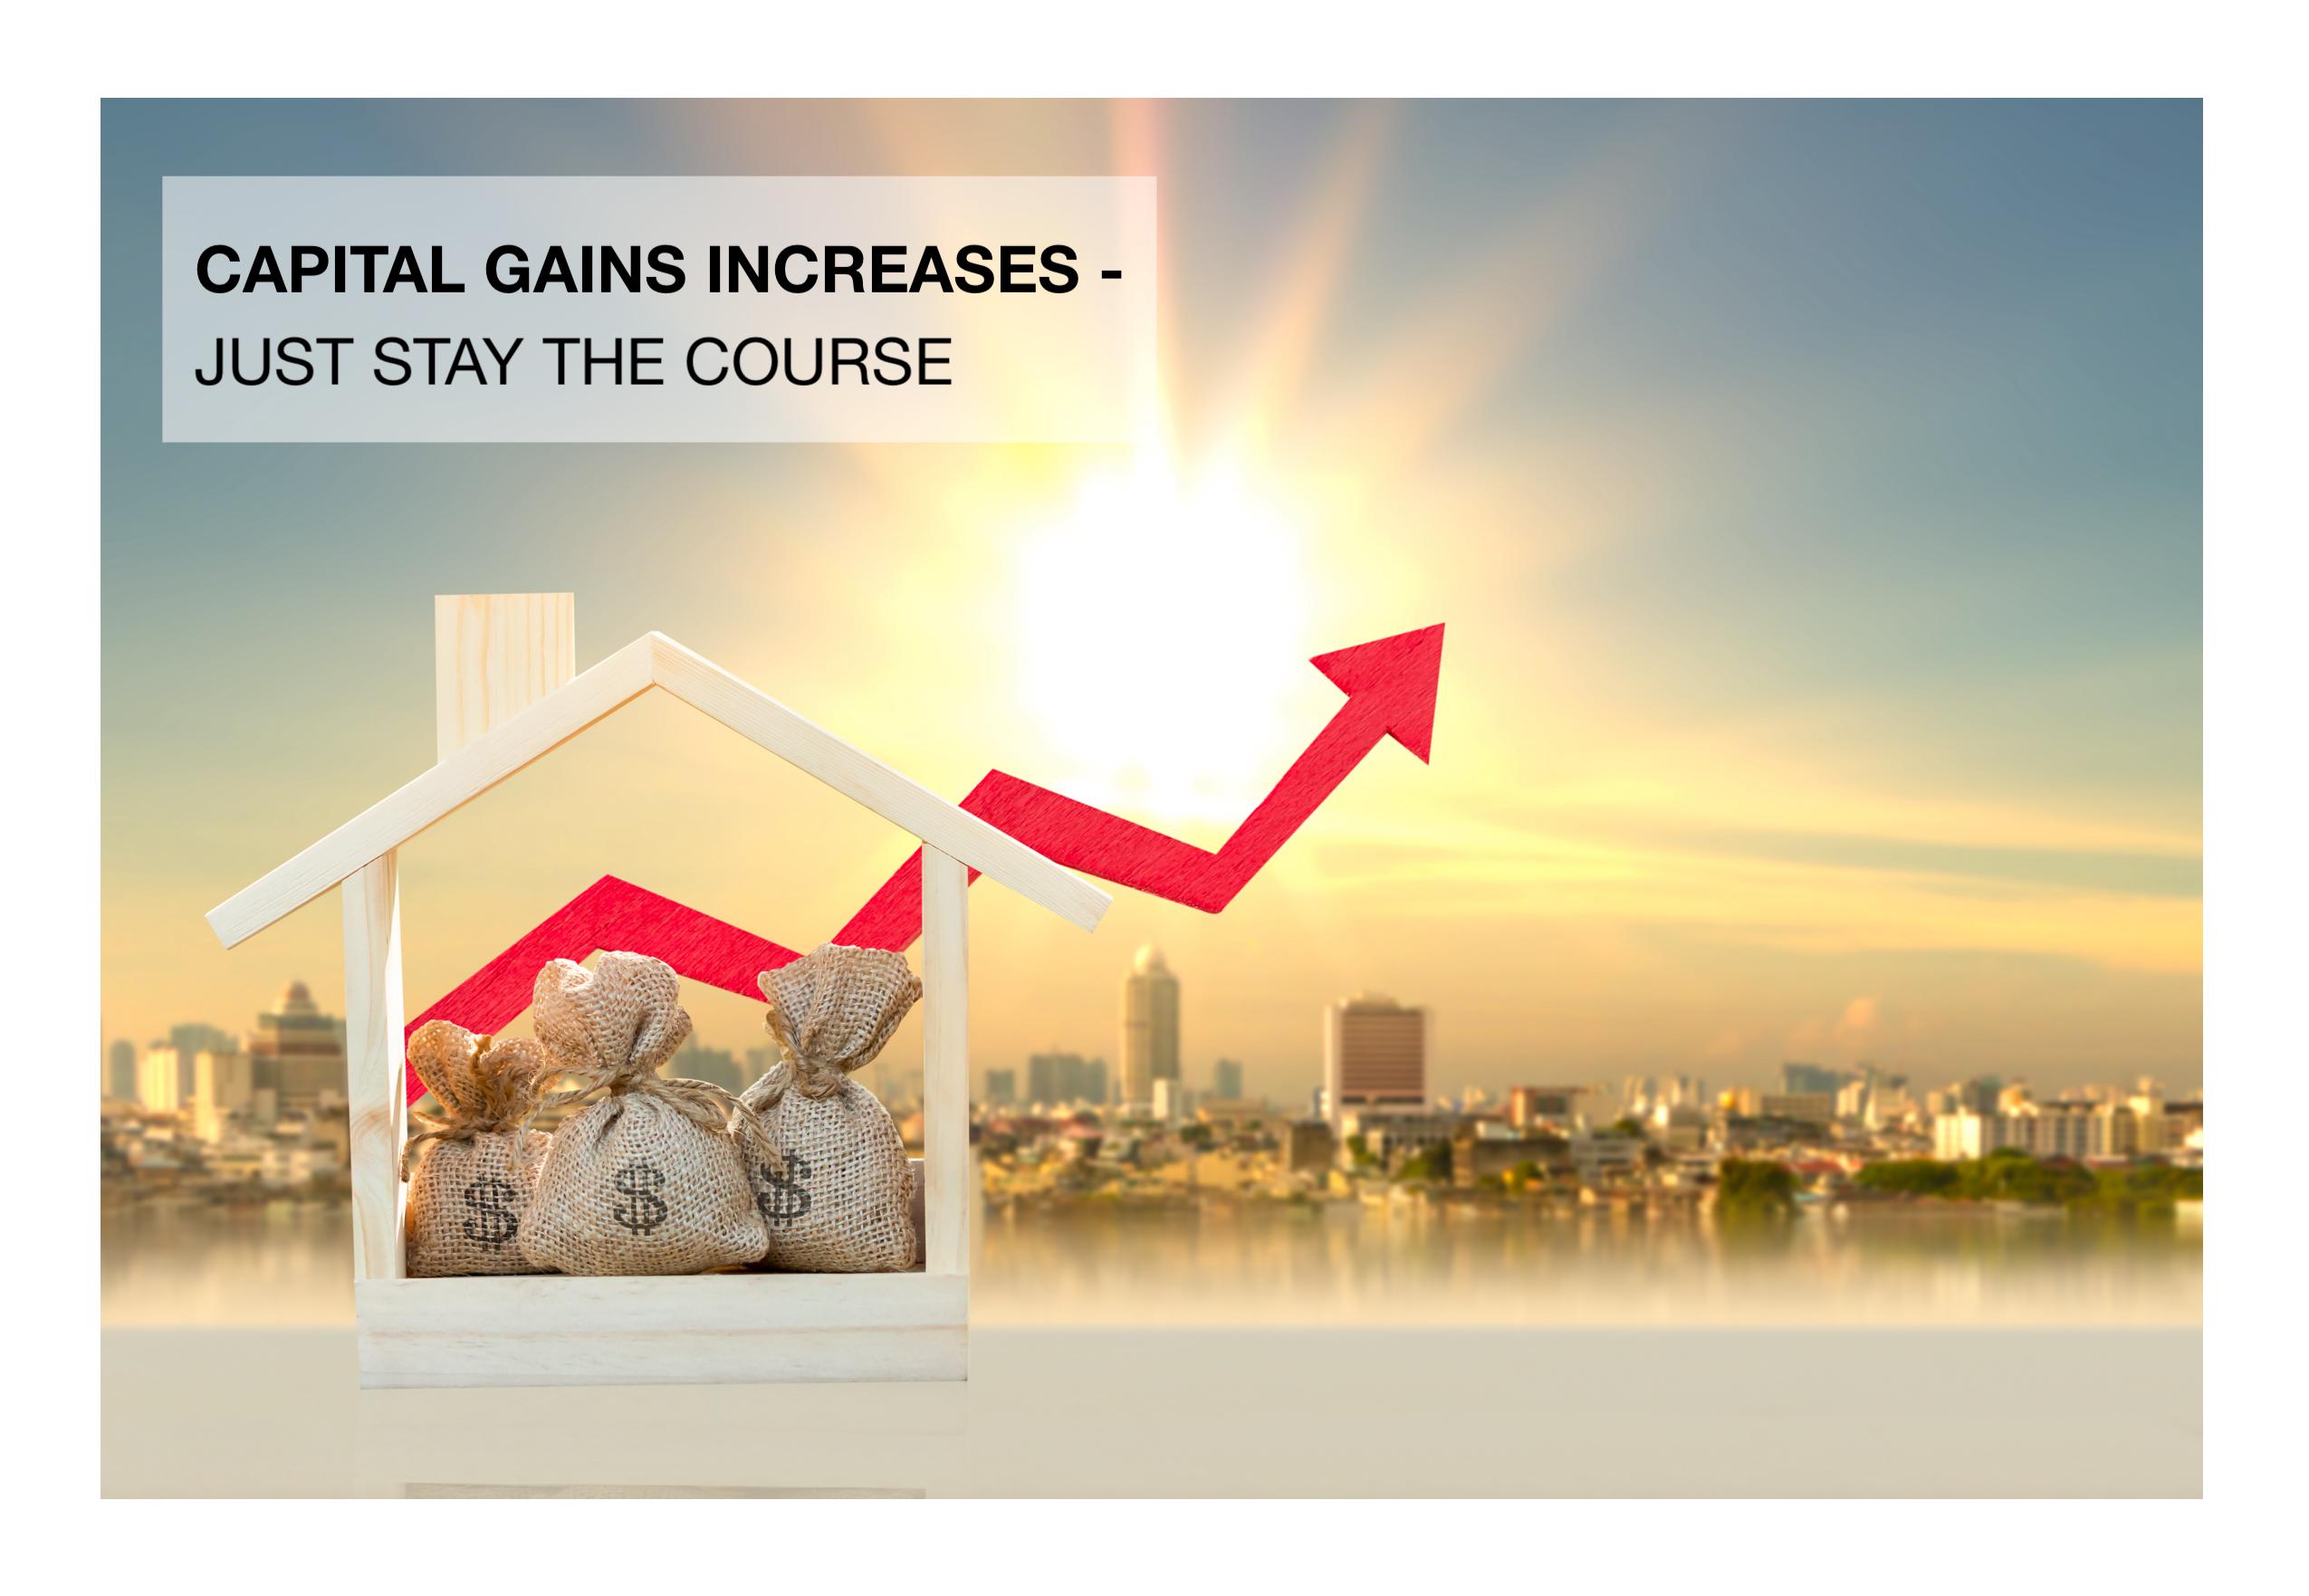 Capital gains changes